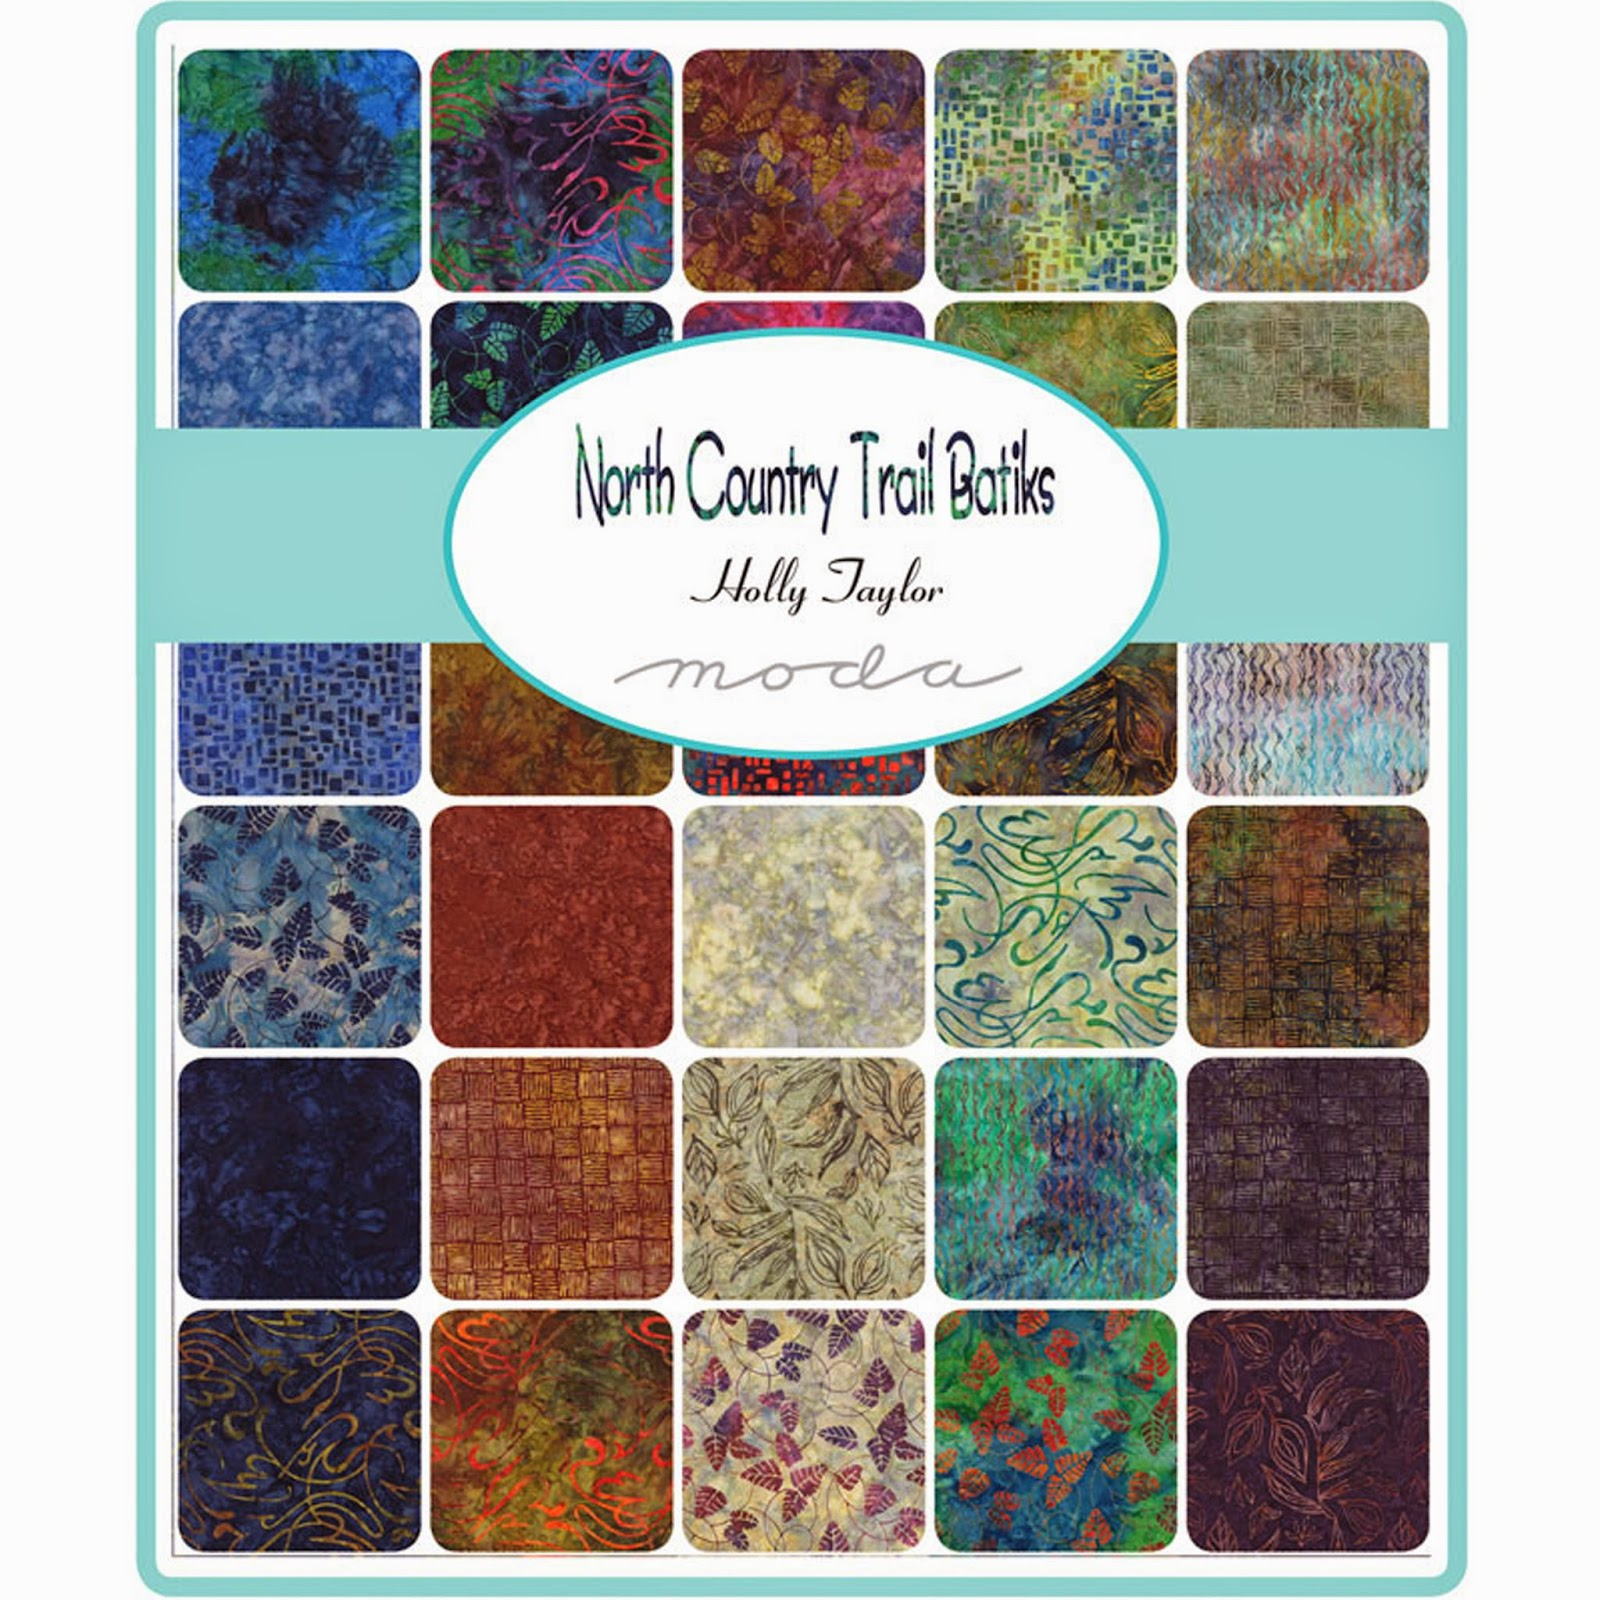 Moda NORTH COUNTRY TRAIL BATIKS Fabric by Holly Taylor for Moda Fabrics